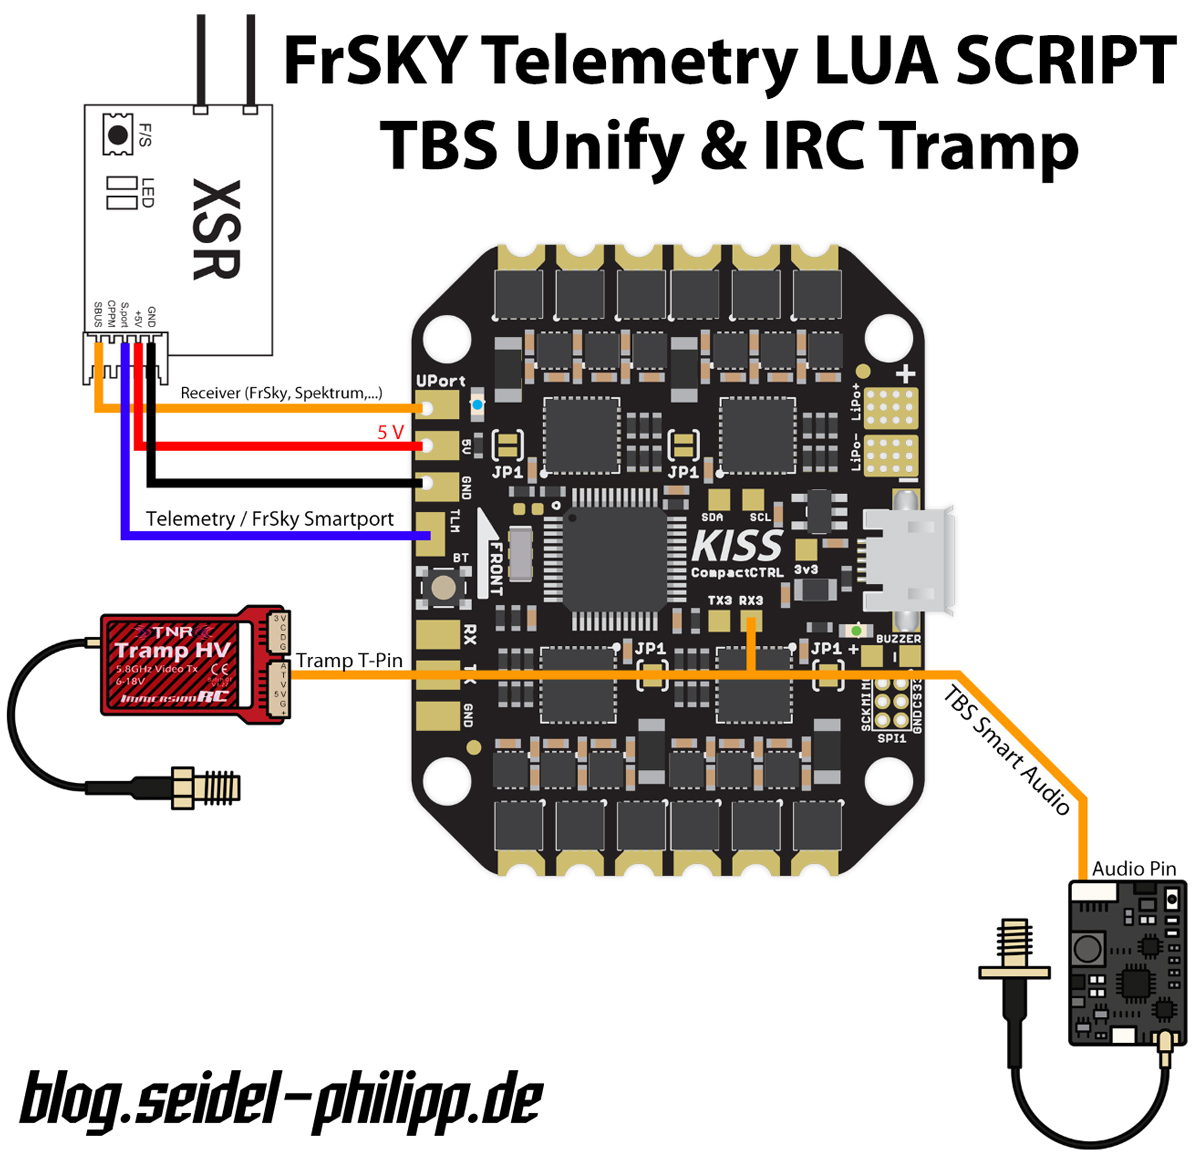 Flyduino KISS FC/CC - LUA Script for PIDs, Settings and VTX